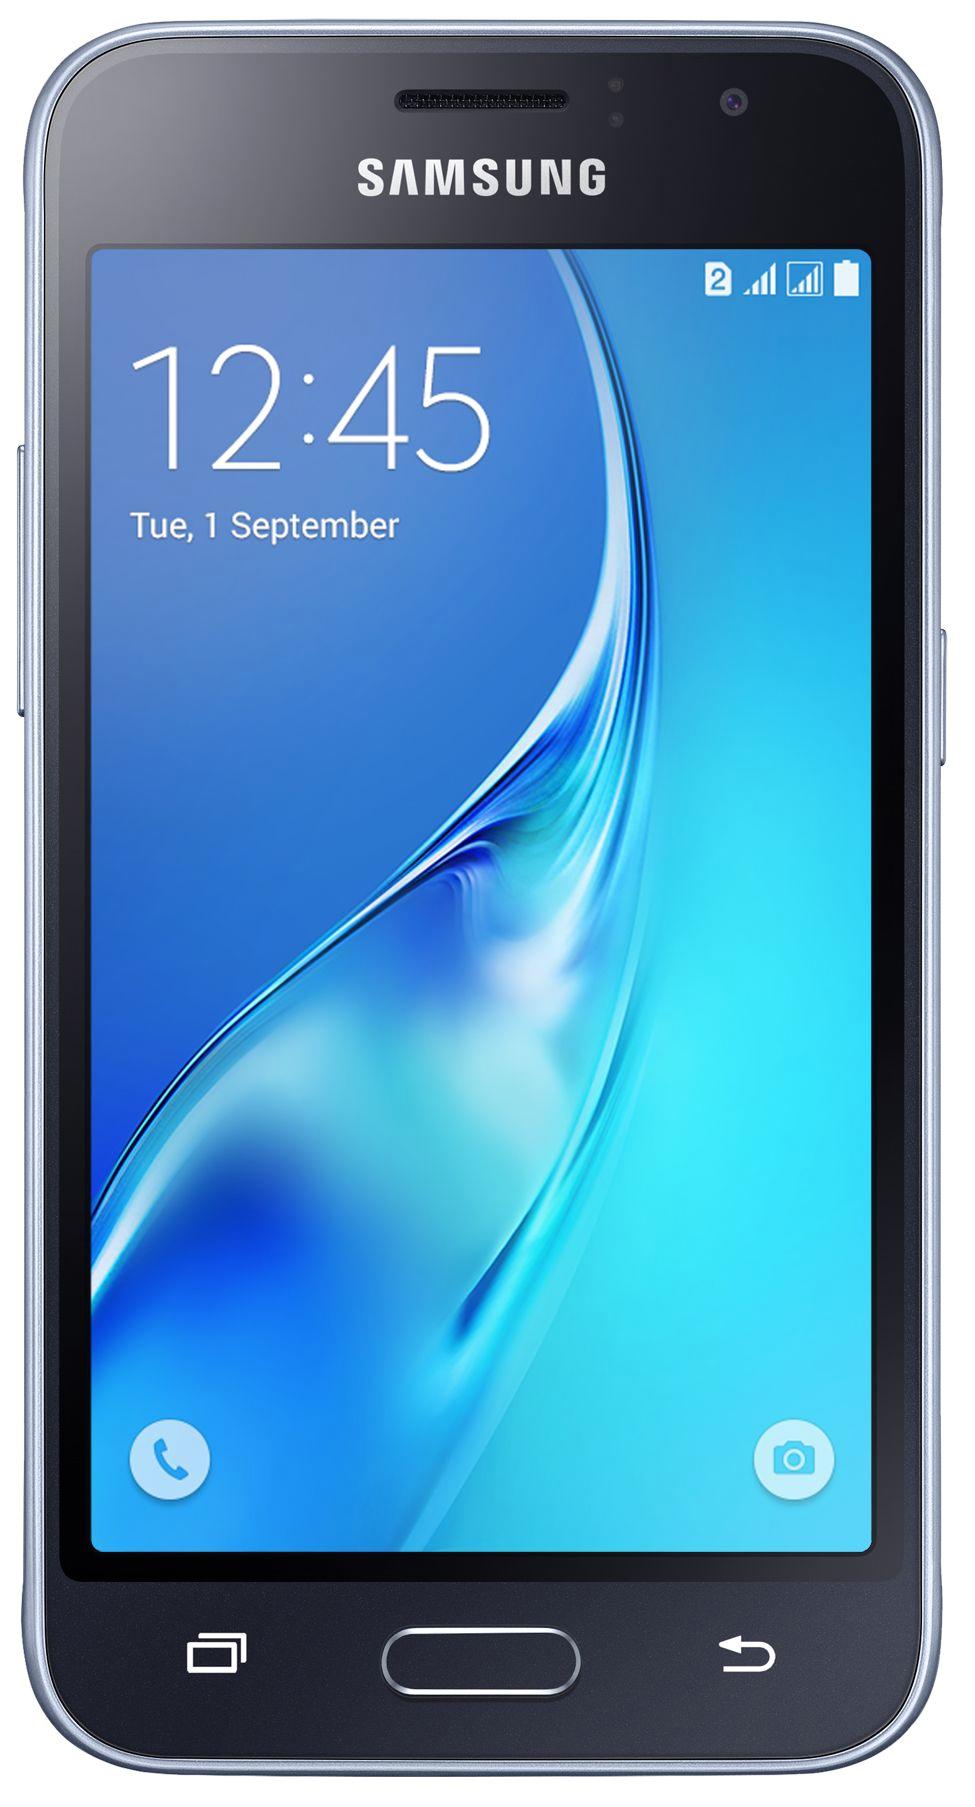 Смартфон Samsung Galaxy J1 (2016) 8Gb Black (SM-J120F)